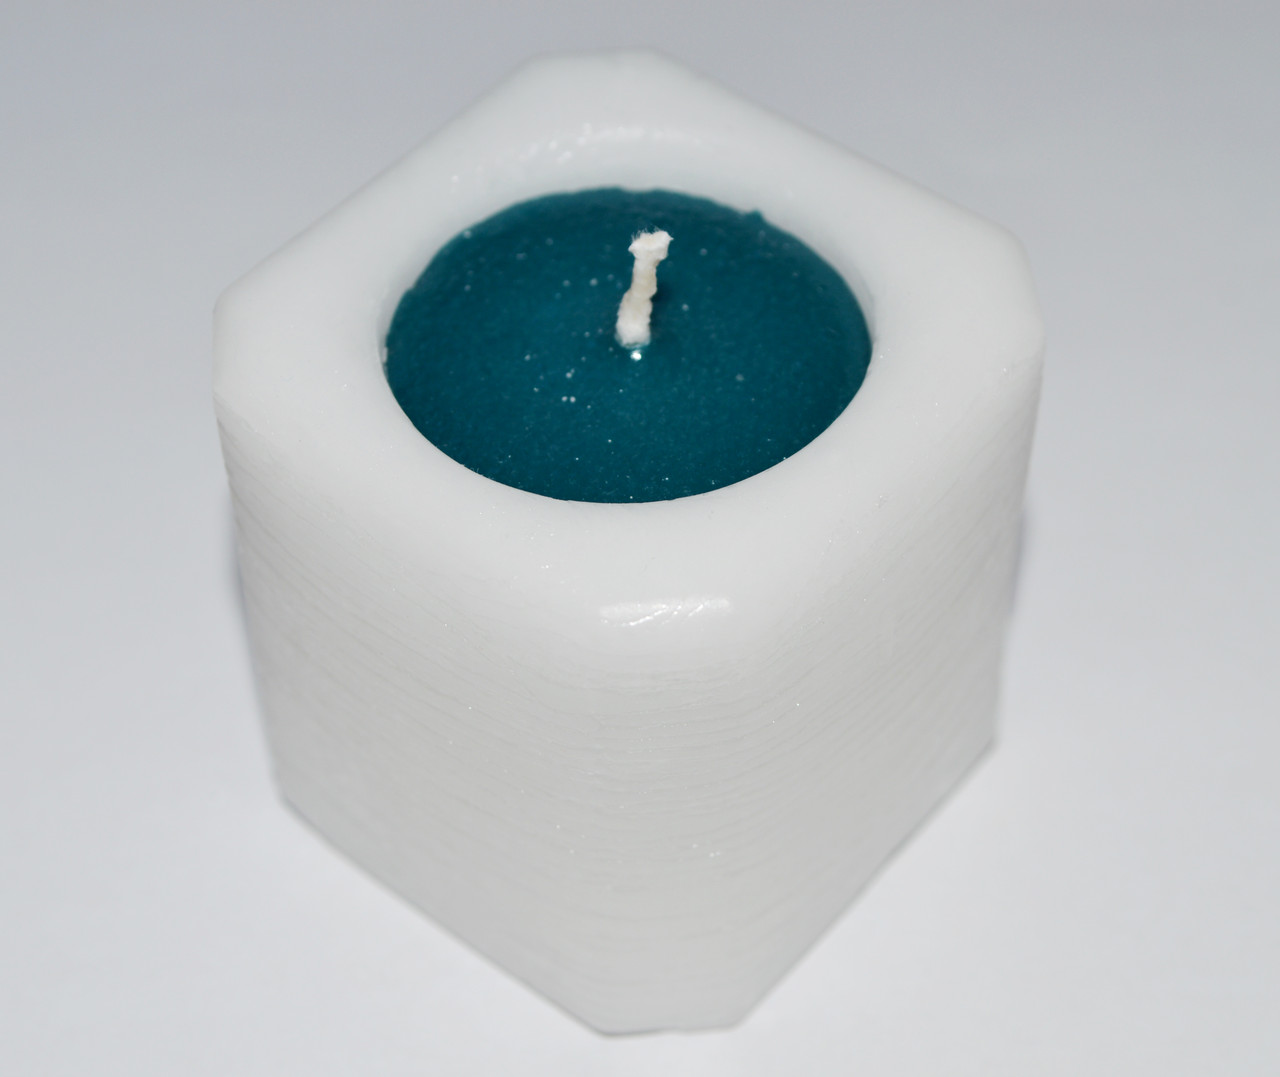 Свеча куб белый+изумрудный 47 х 47 мм